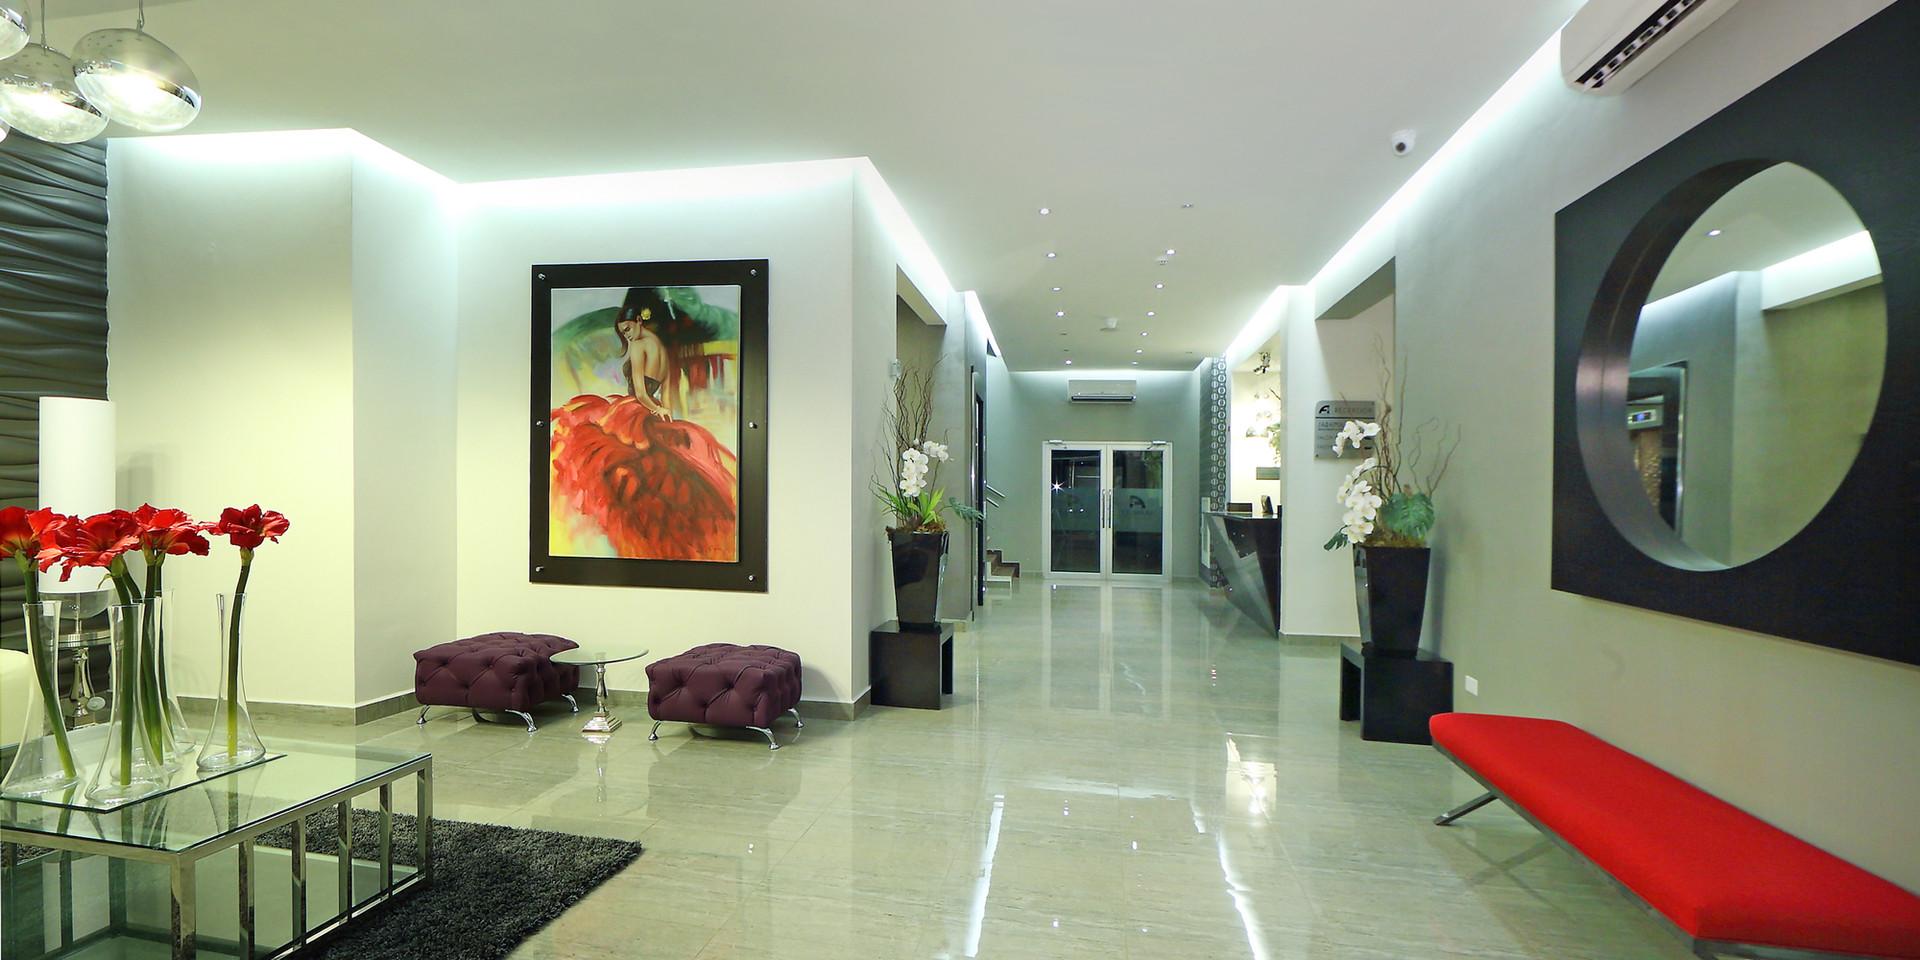 Lobby and reception of Hotel Aranjuez